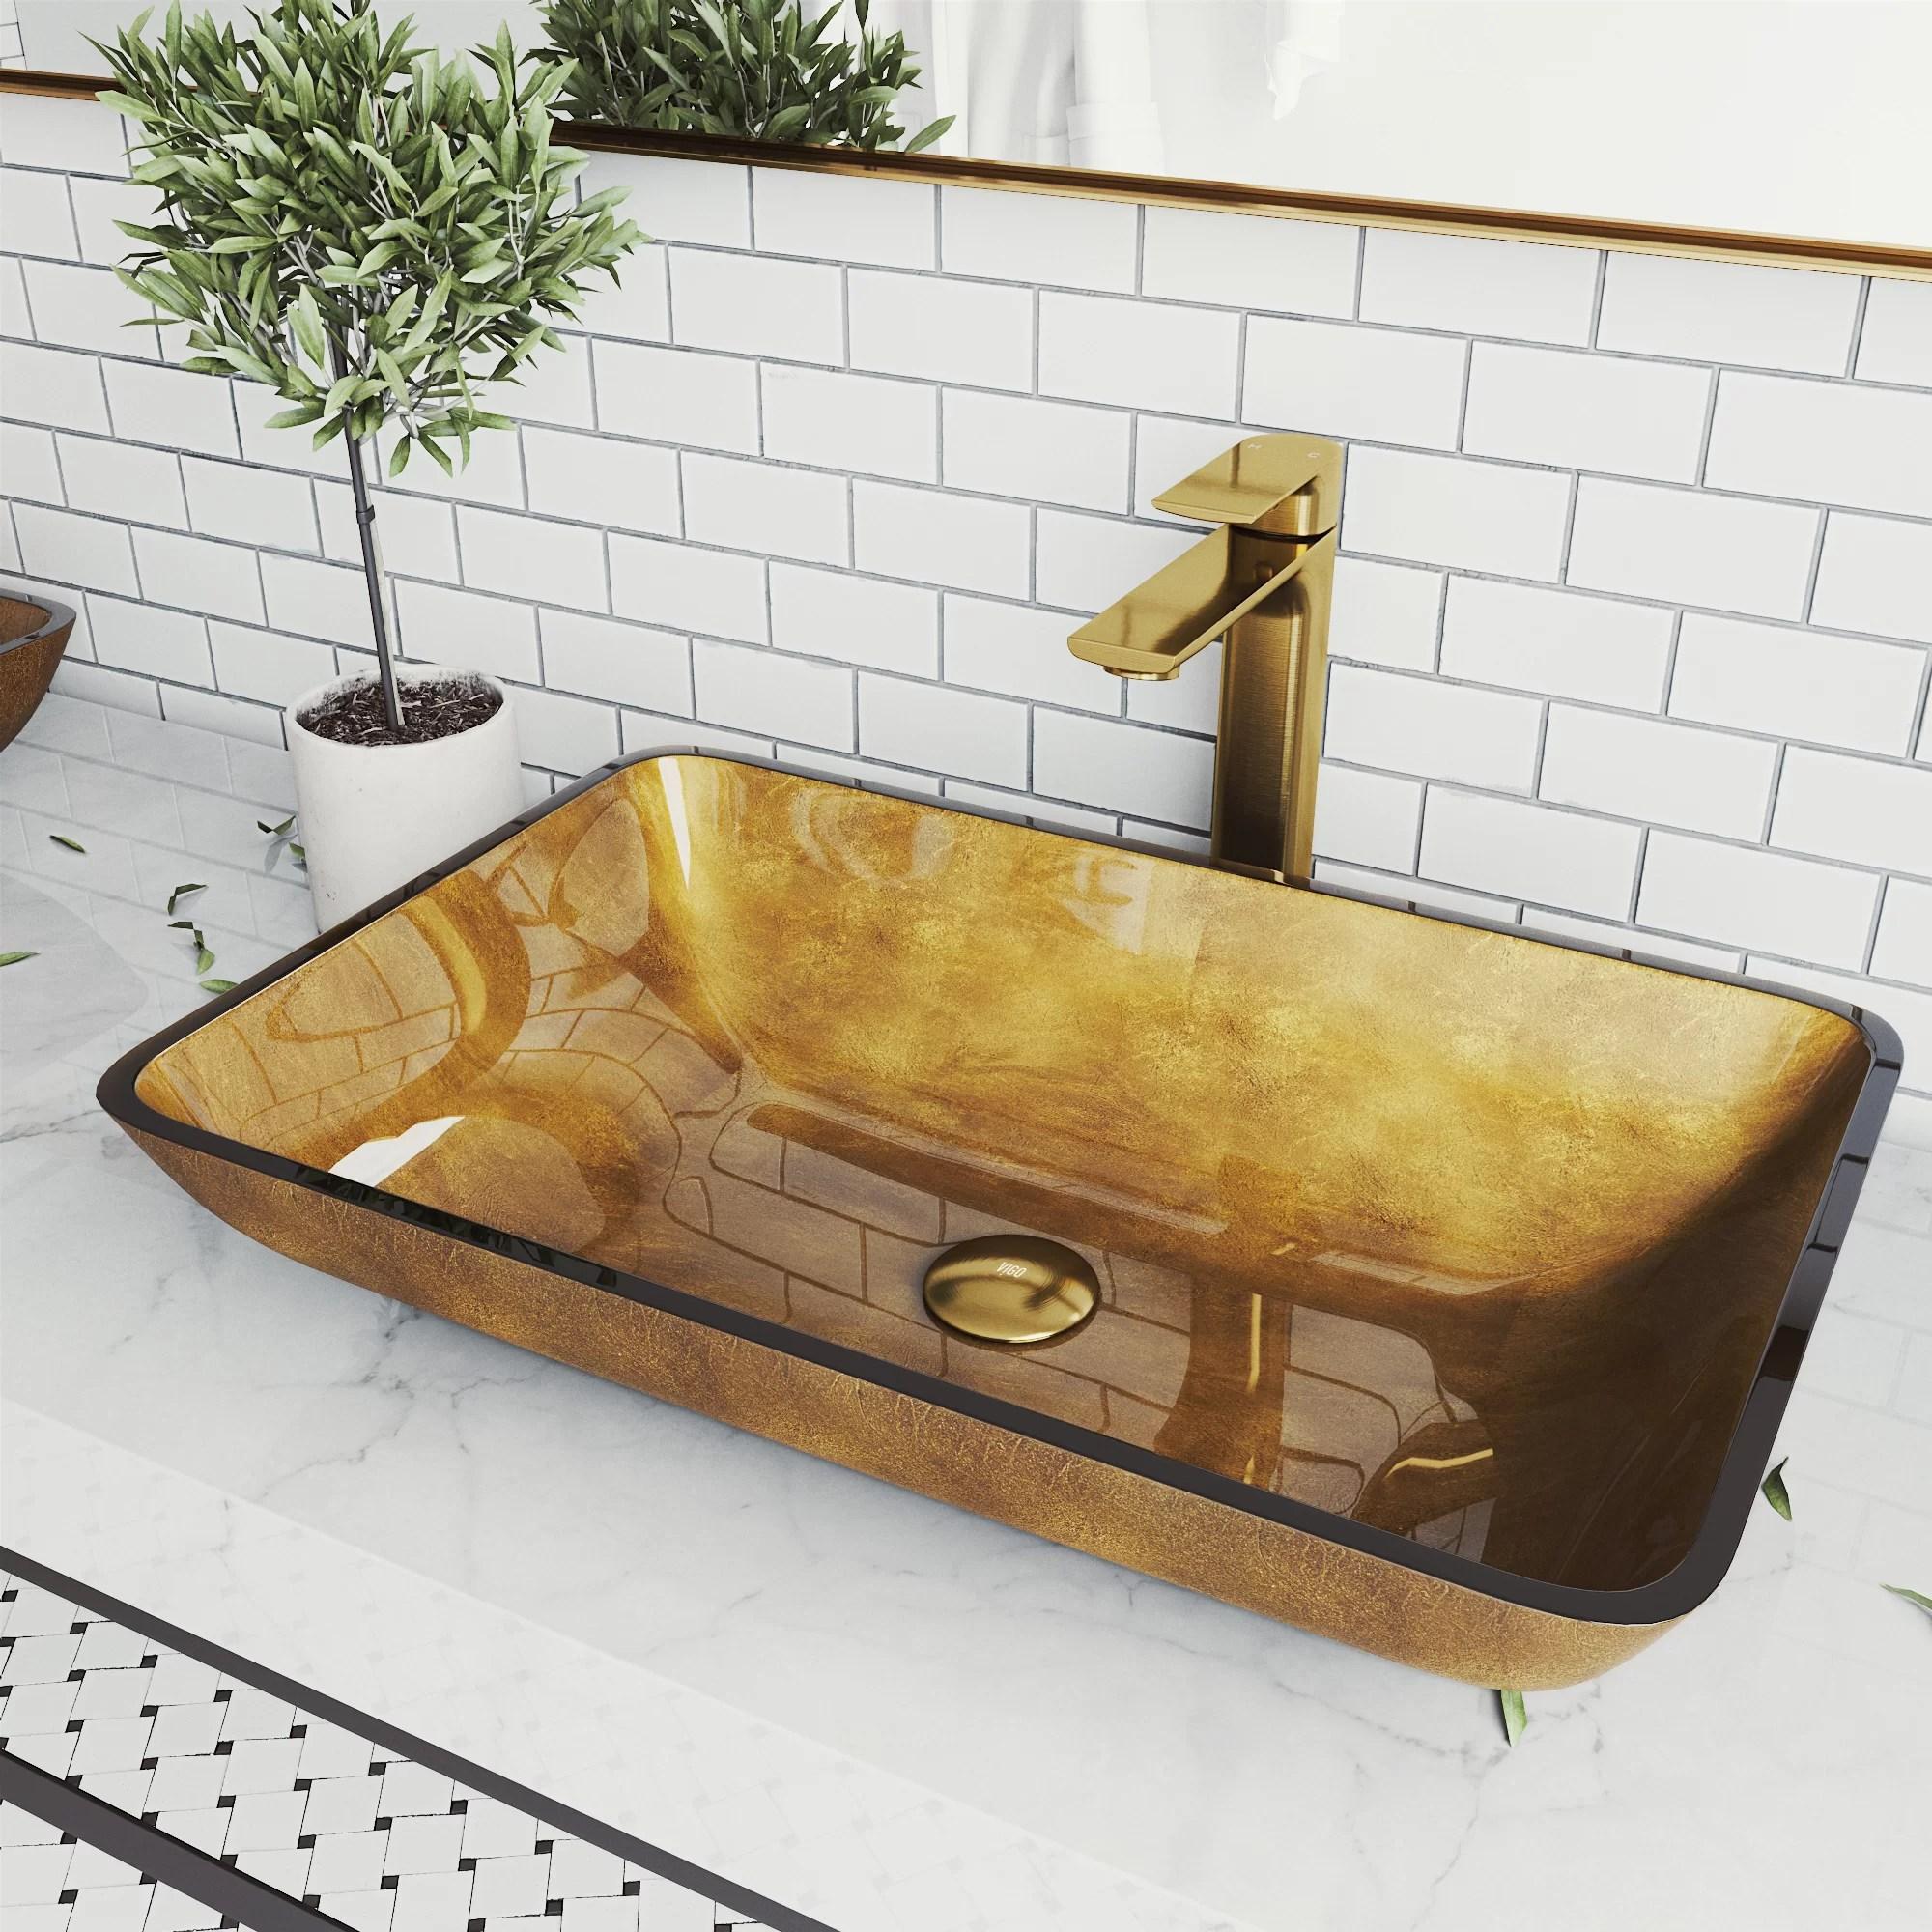 handmade copper glass rectangular vessel bathroom sink with faucet